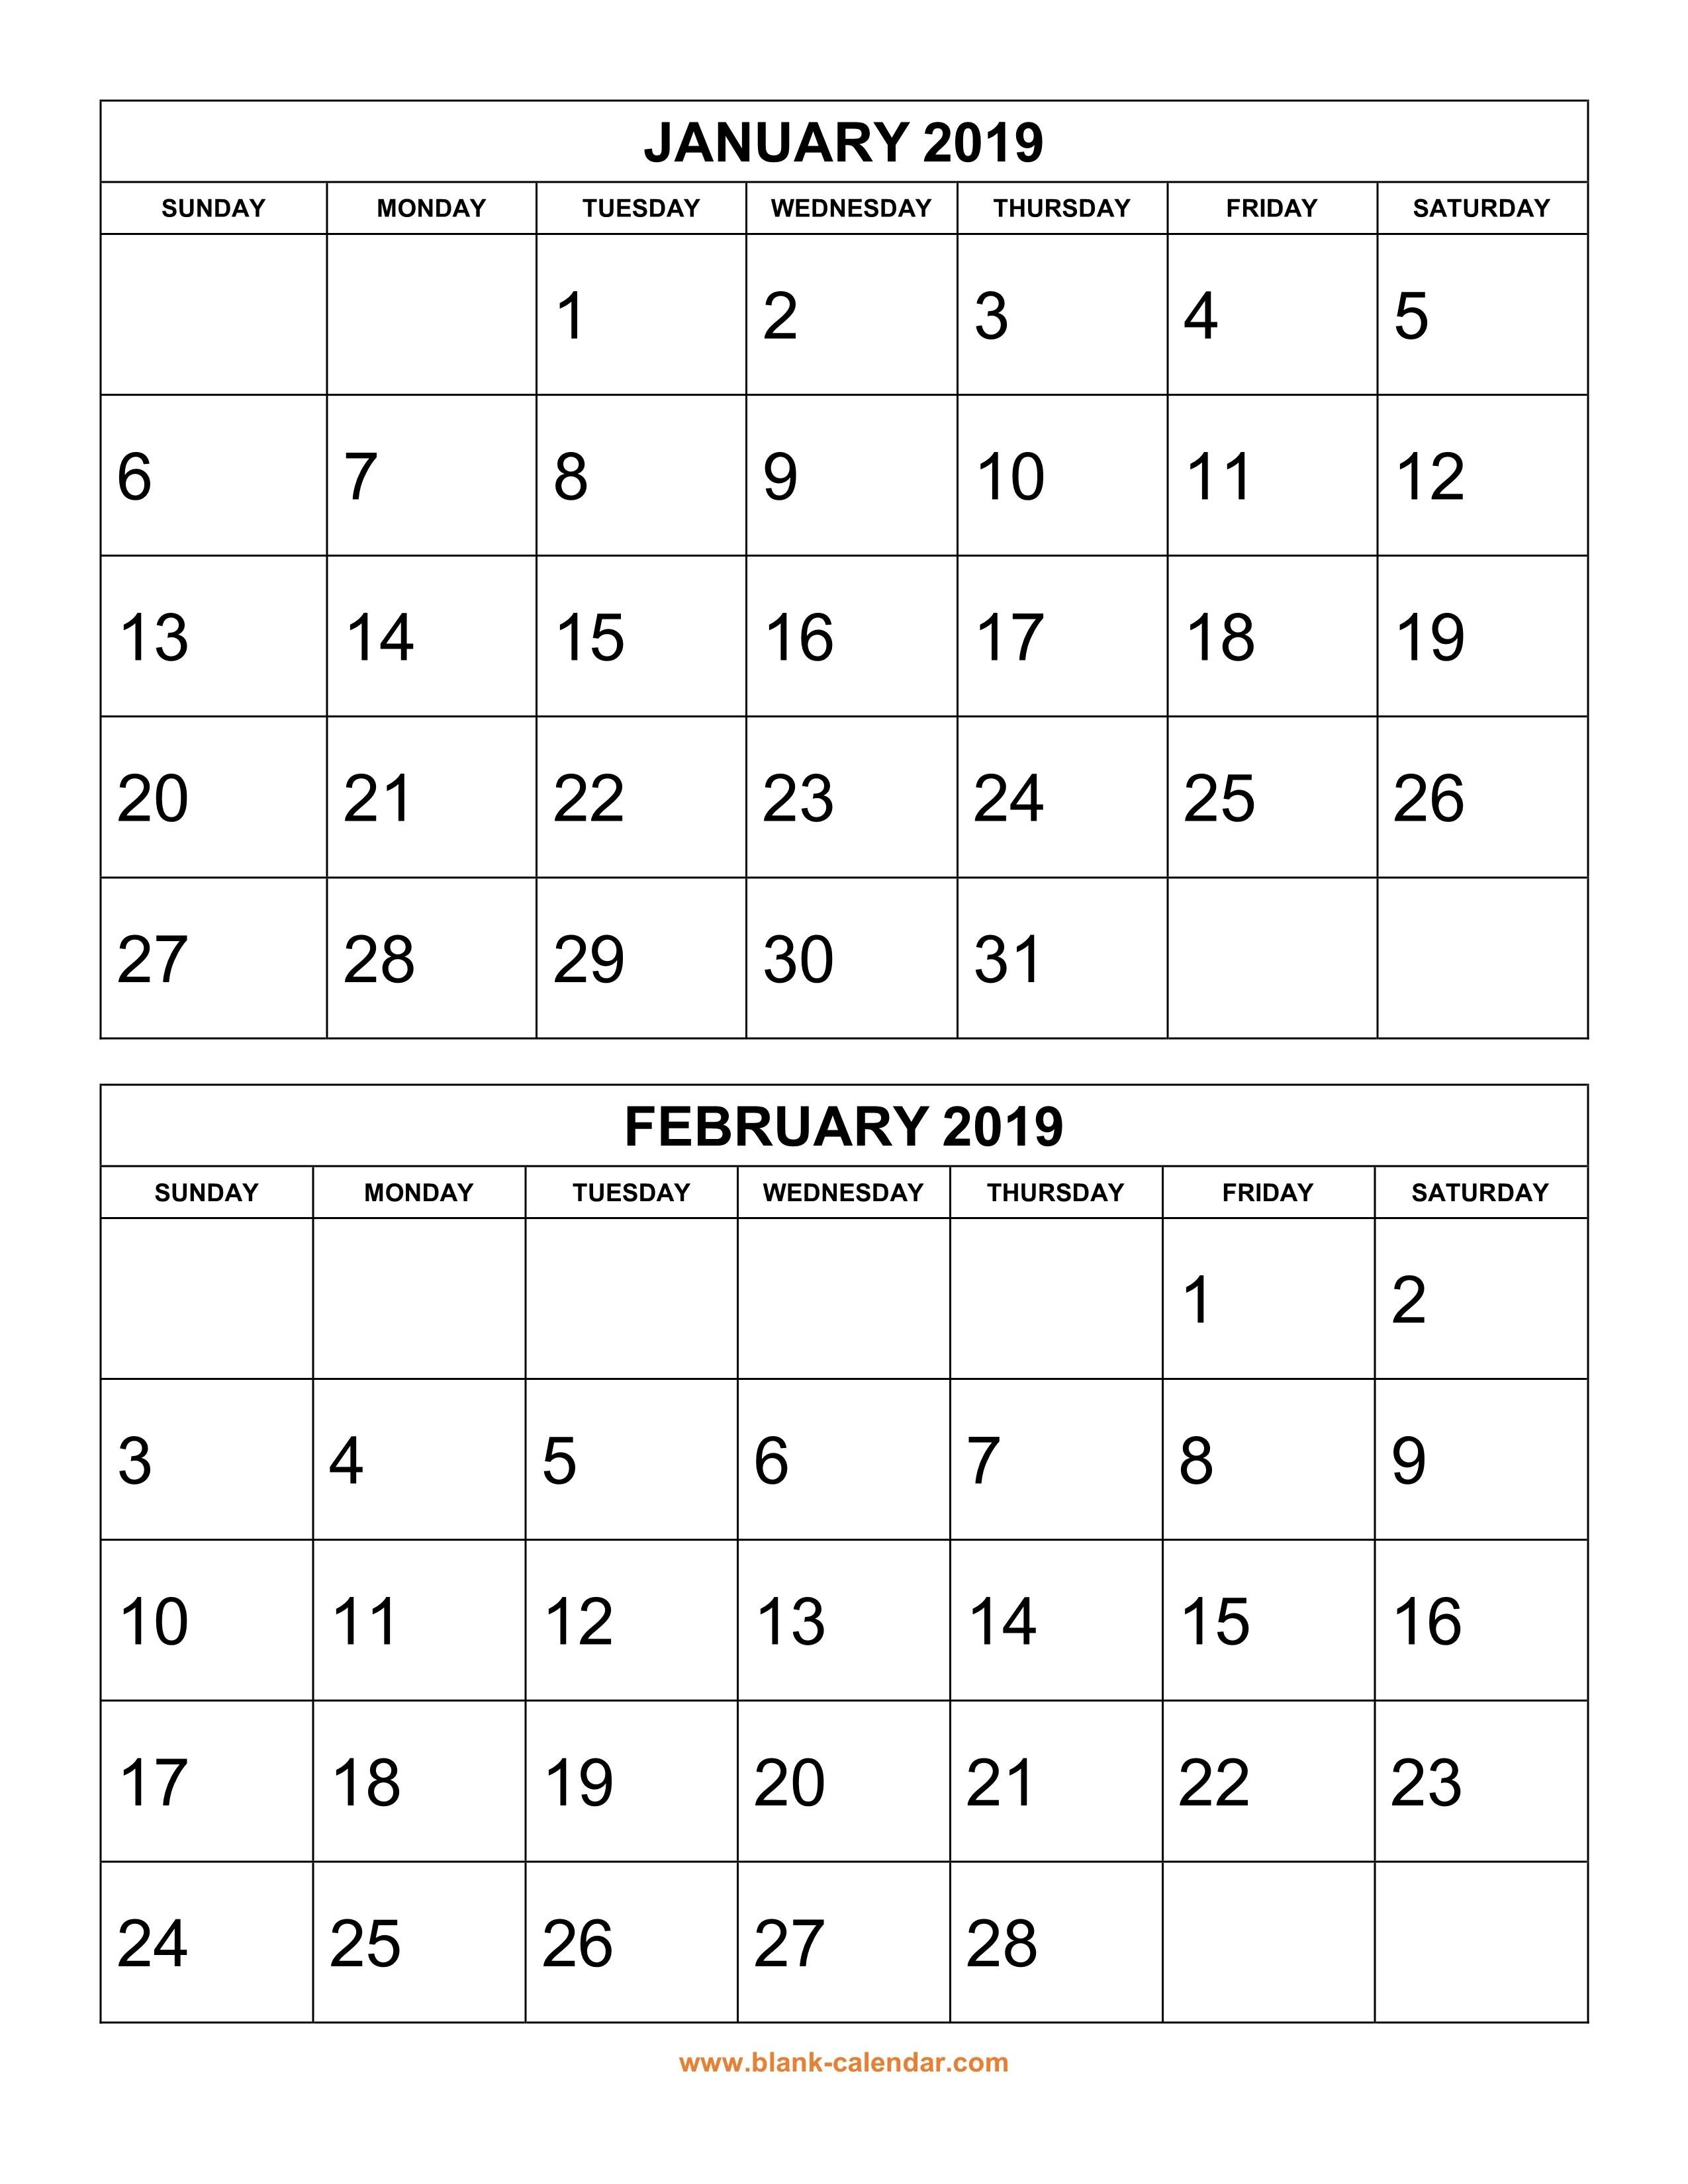 Free Download Printable Calendar 2019, 2 Months Per Page, 6-Calendar Blanks 6 Months